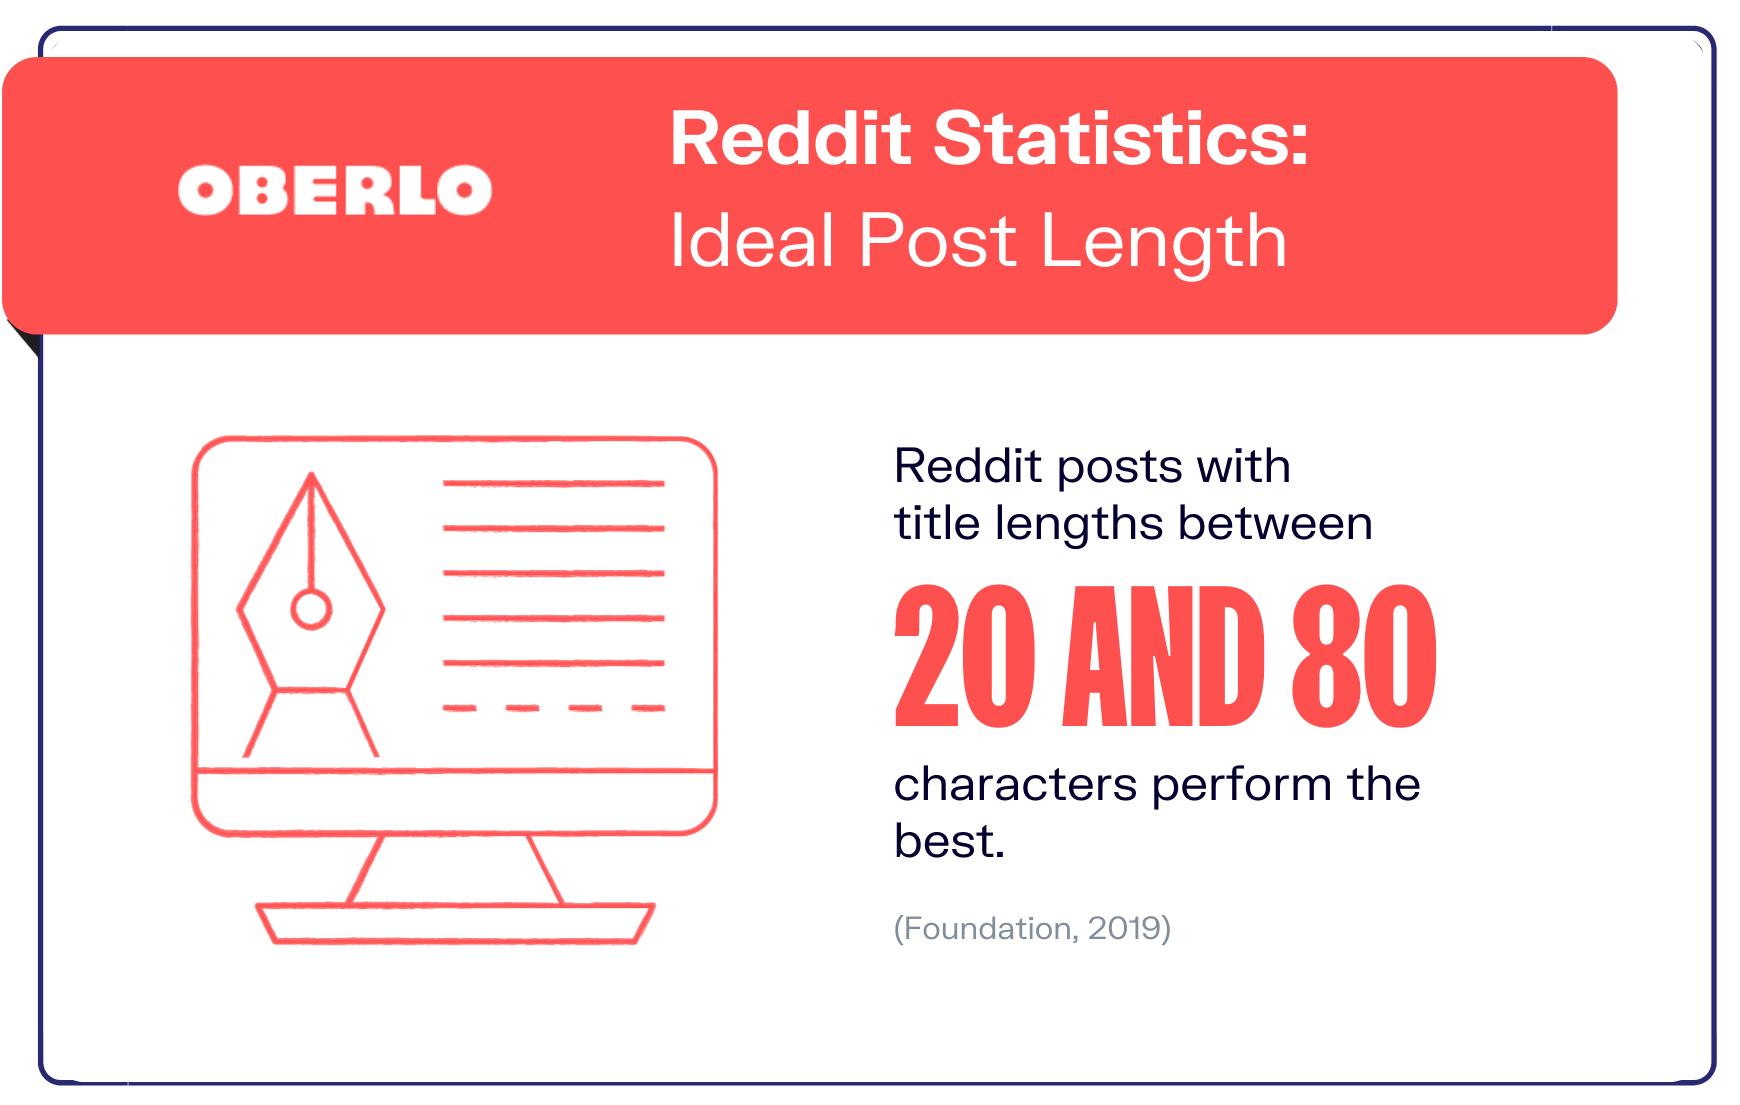 graphic of reddit statistic #9